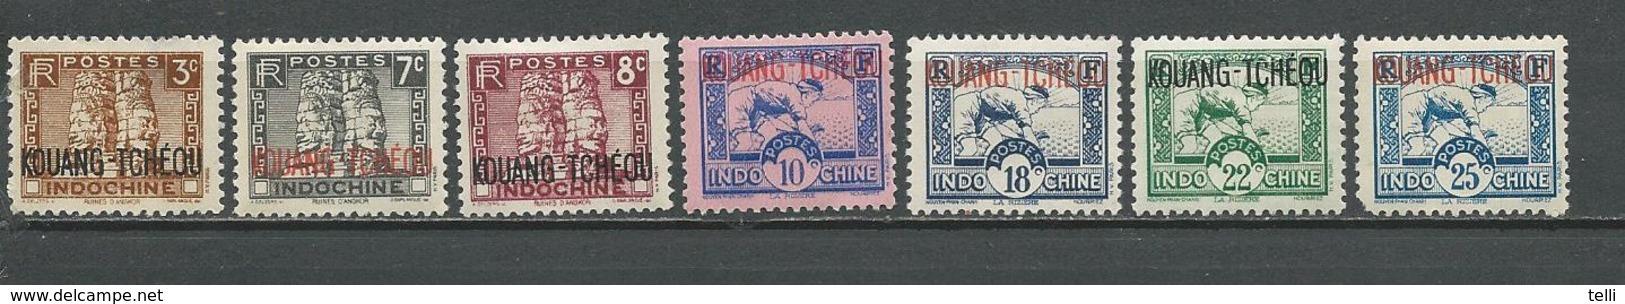 KOUANG TCHEOU Scott 107,114,115,118,120,123,125 Yvert 125,128,129,131,131A,132,133 (7) * 4,70 $ 1941 - Unused Stamps